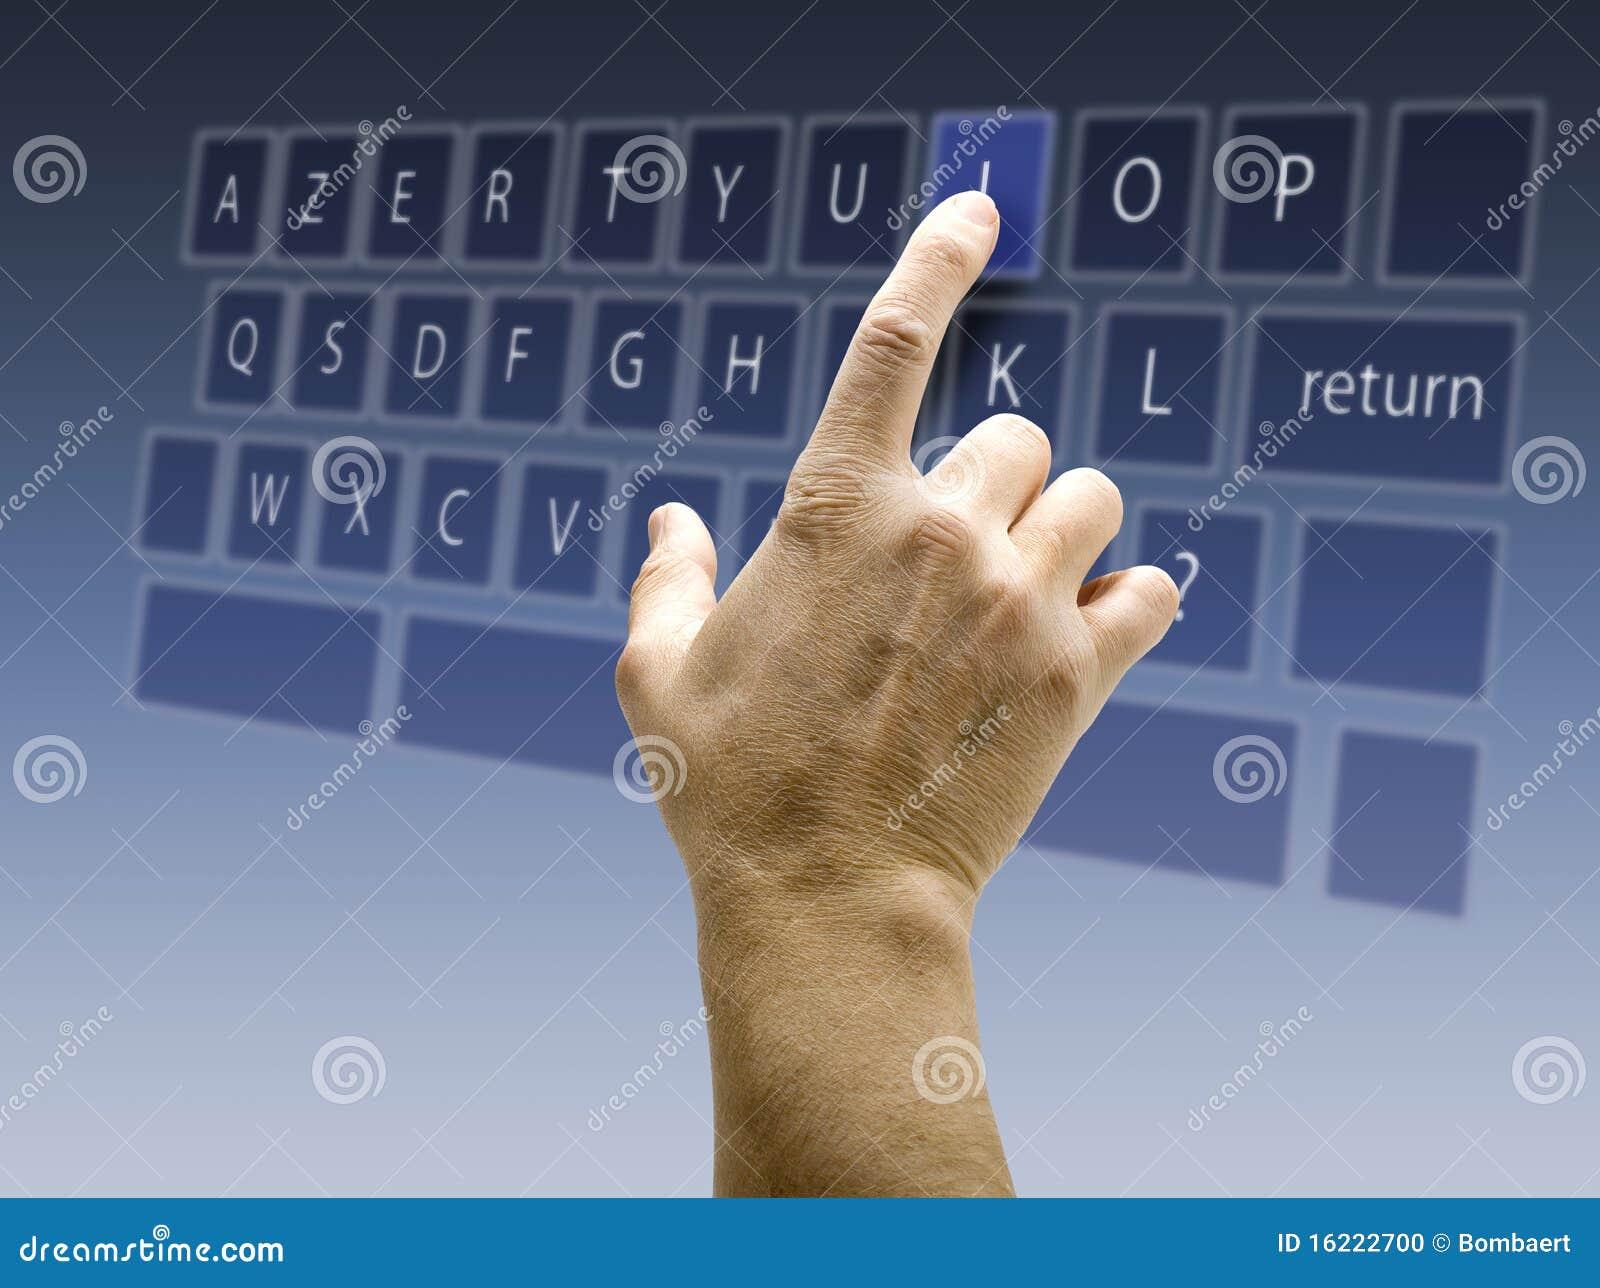 Fond d'écran tactile